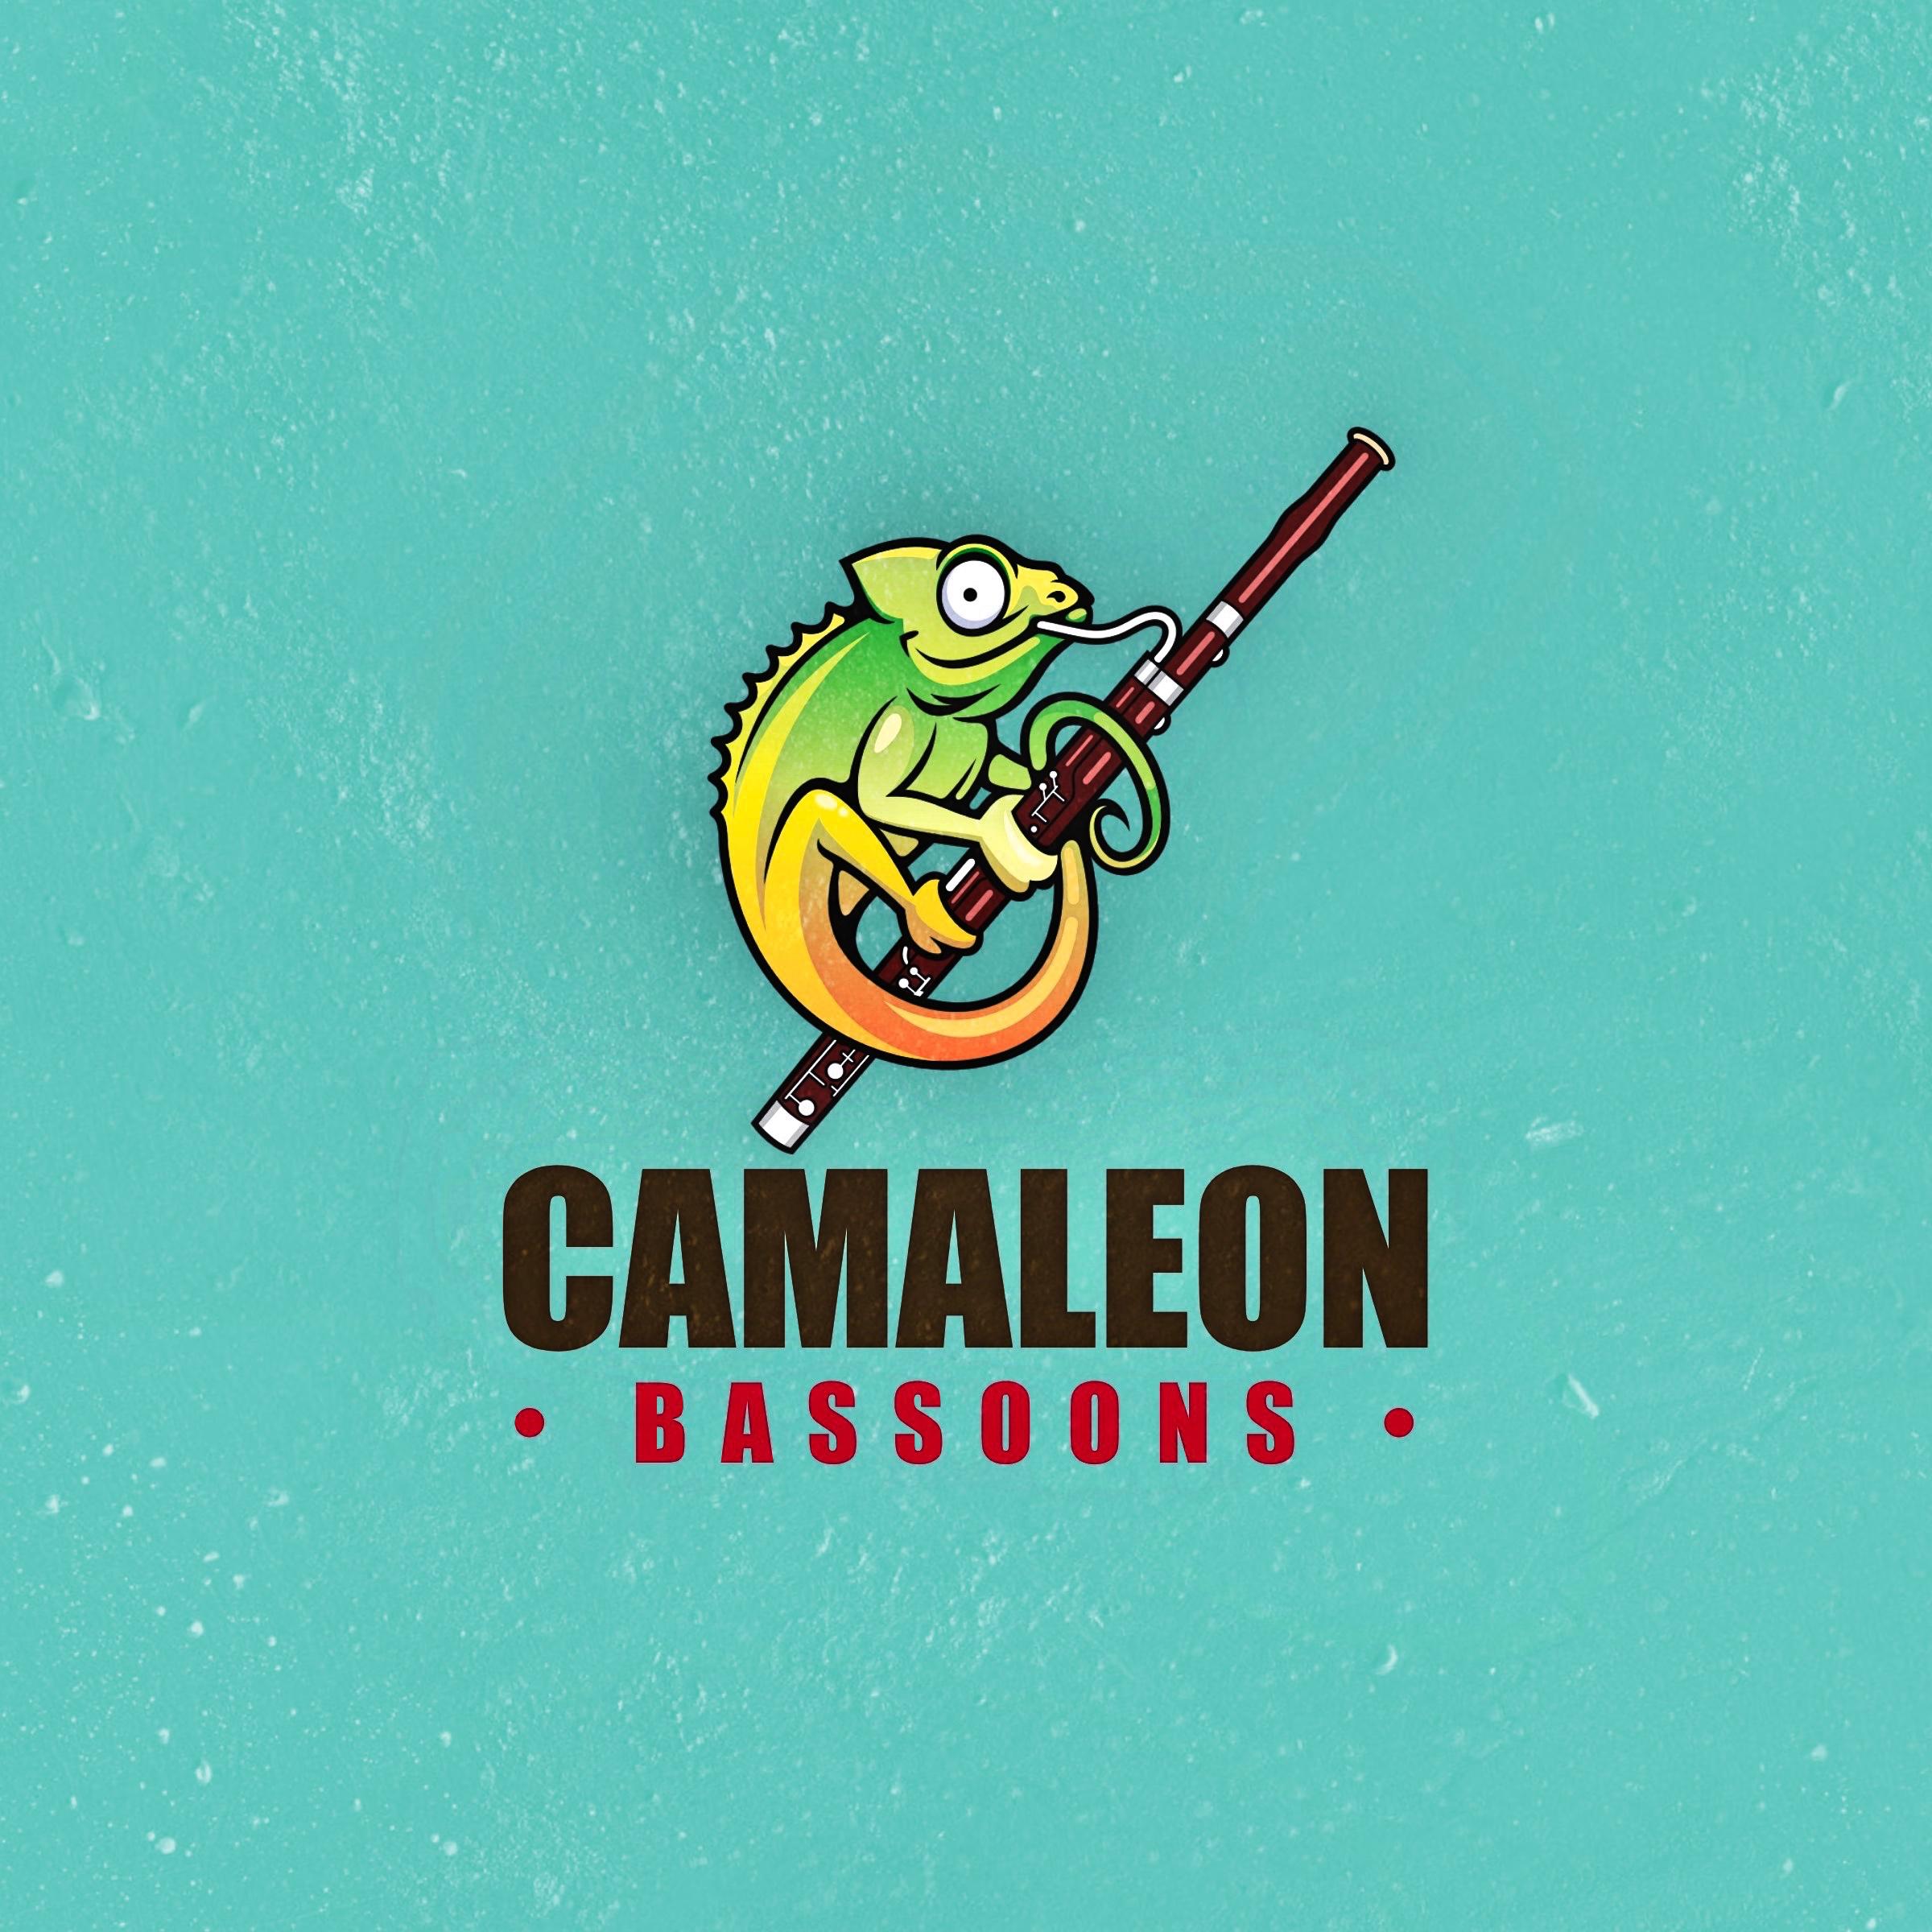 Camaleon Bassoons